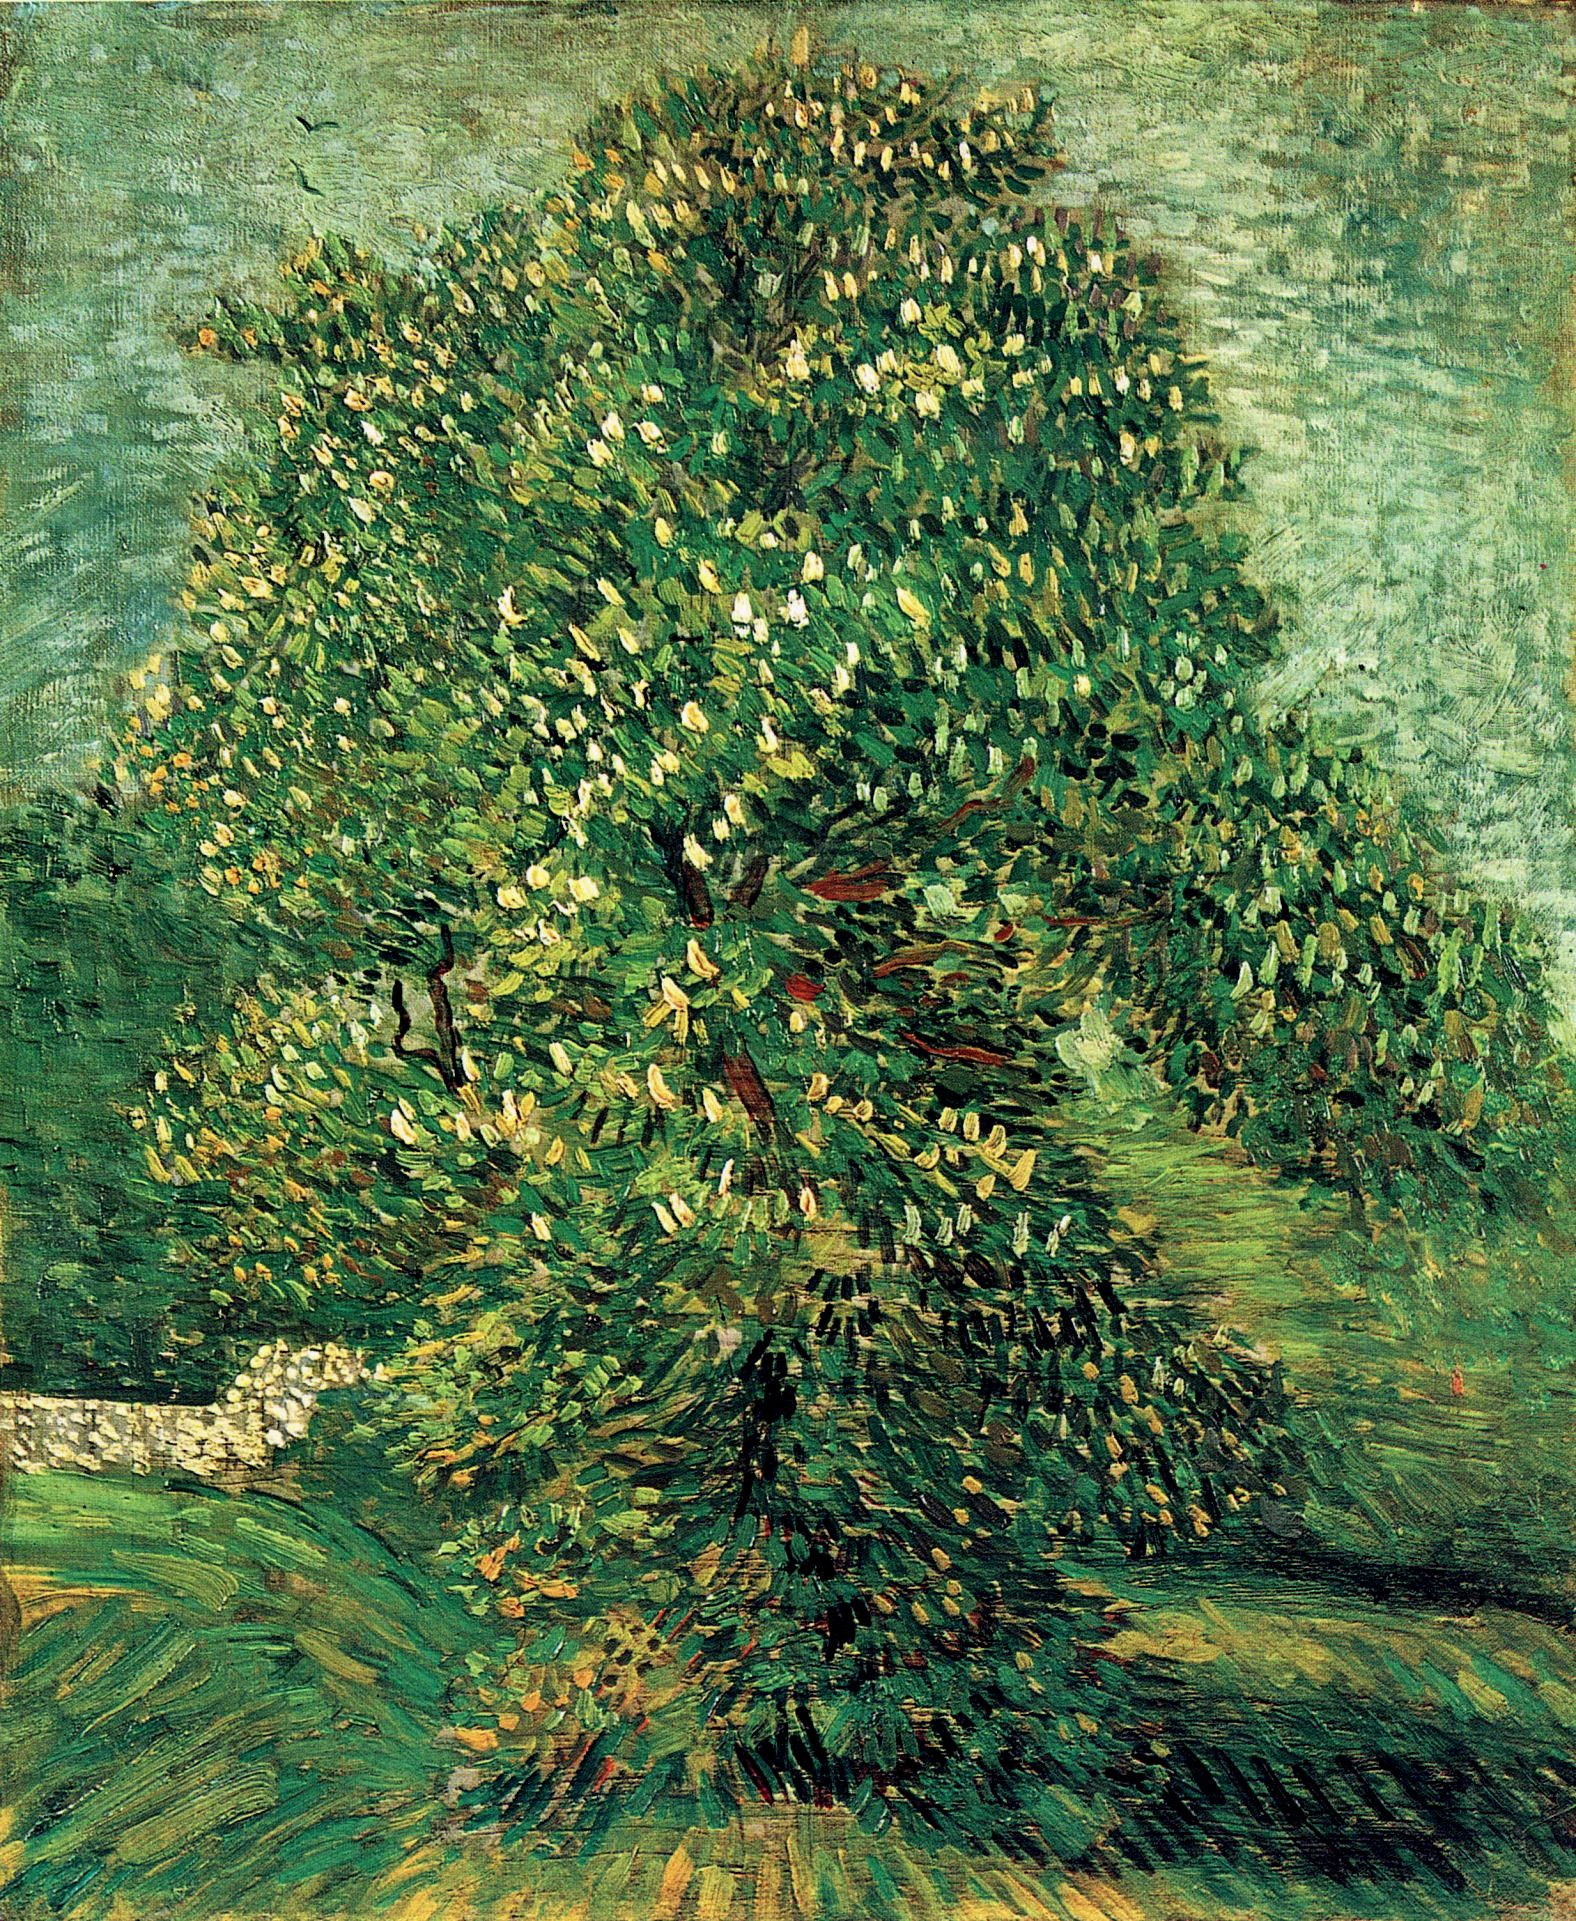 Chestnut tree in blossom, 1887. Vincent van Gogh. Van Gogh Museum, Amsterdam, Netherlands